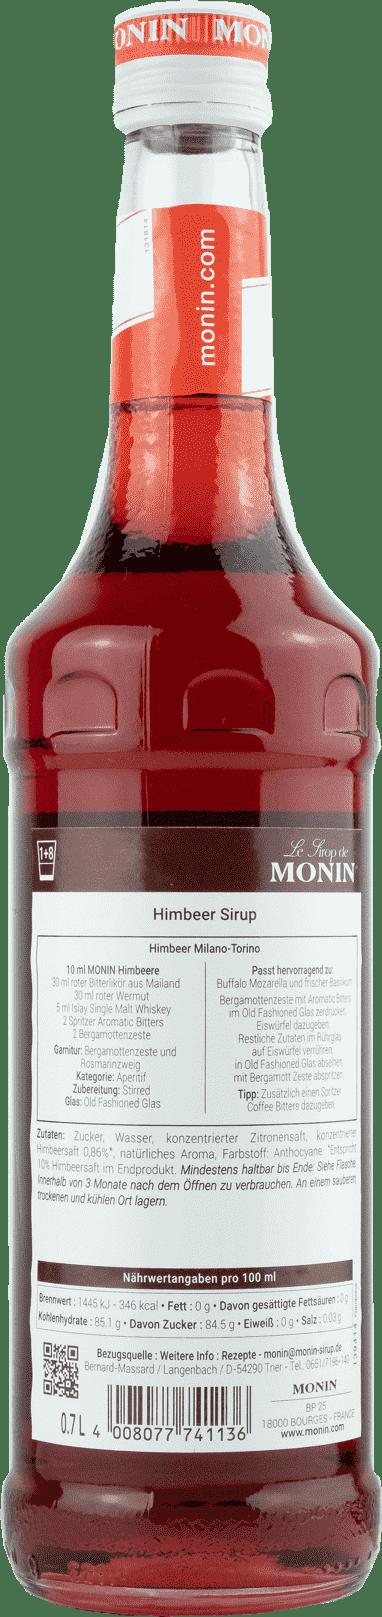 Monin Sirup Himbeere 0,7l